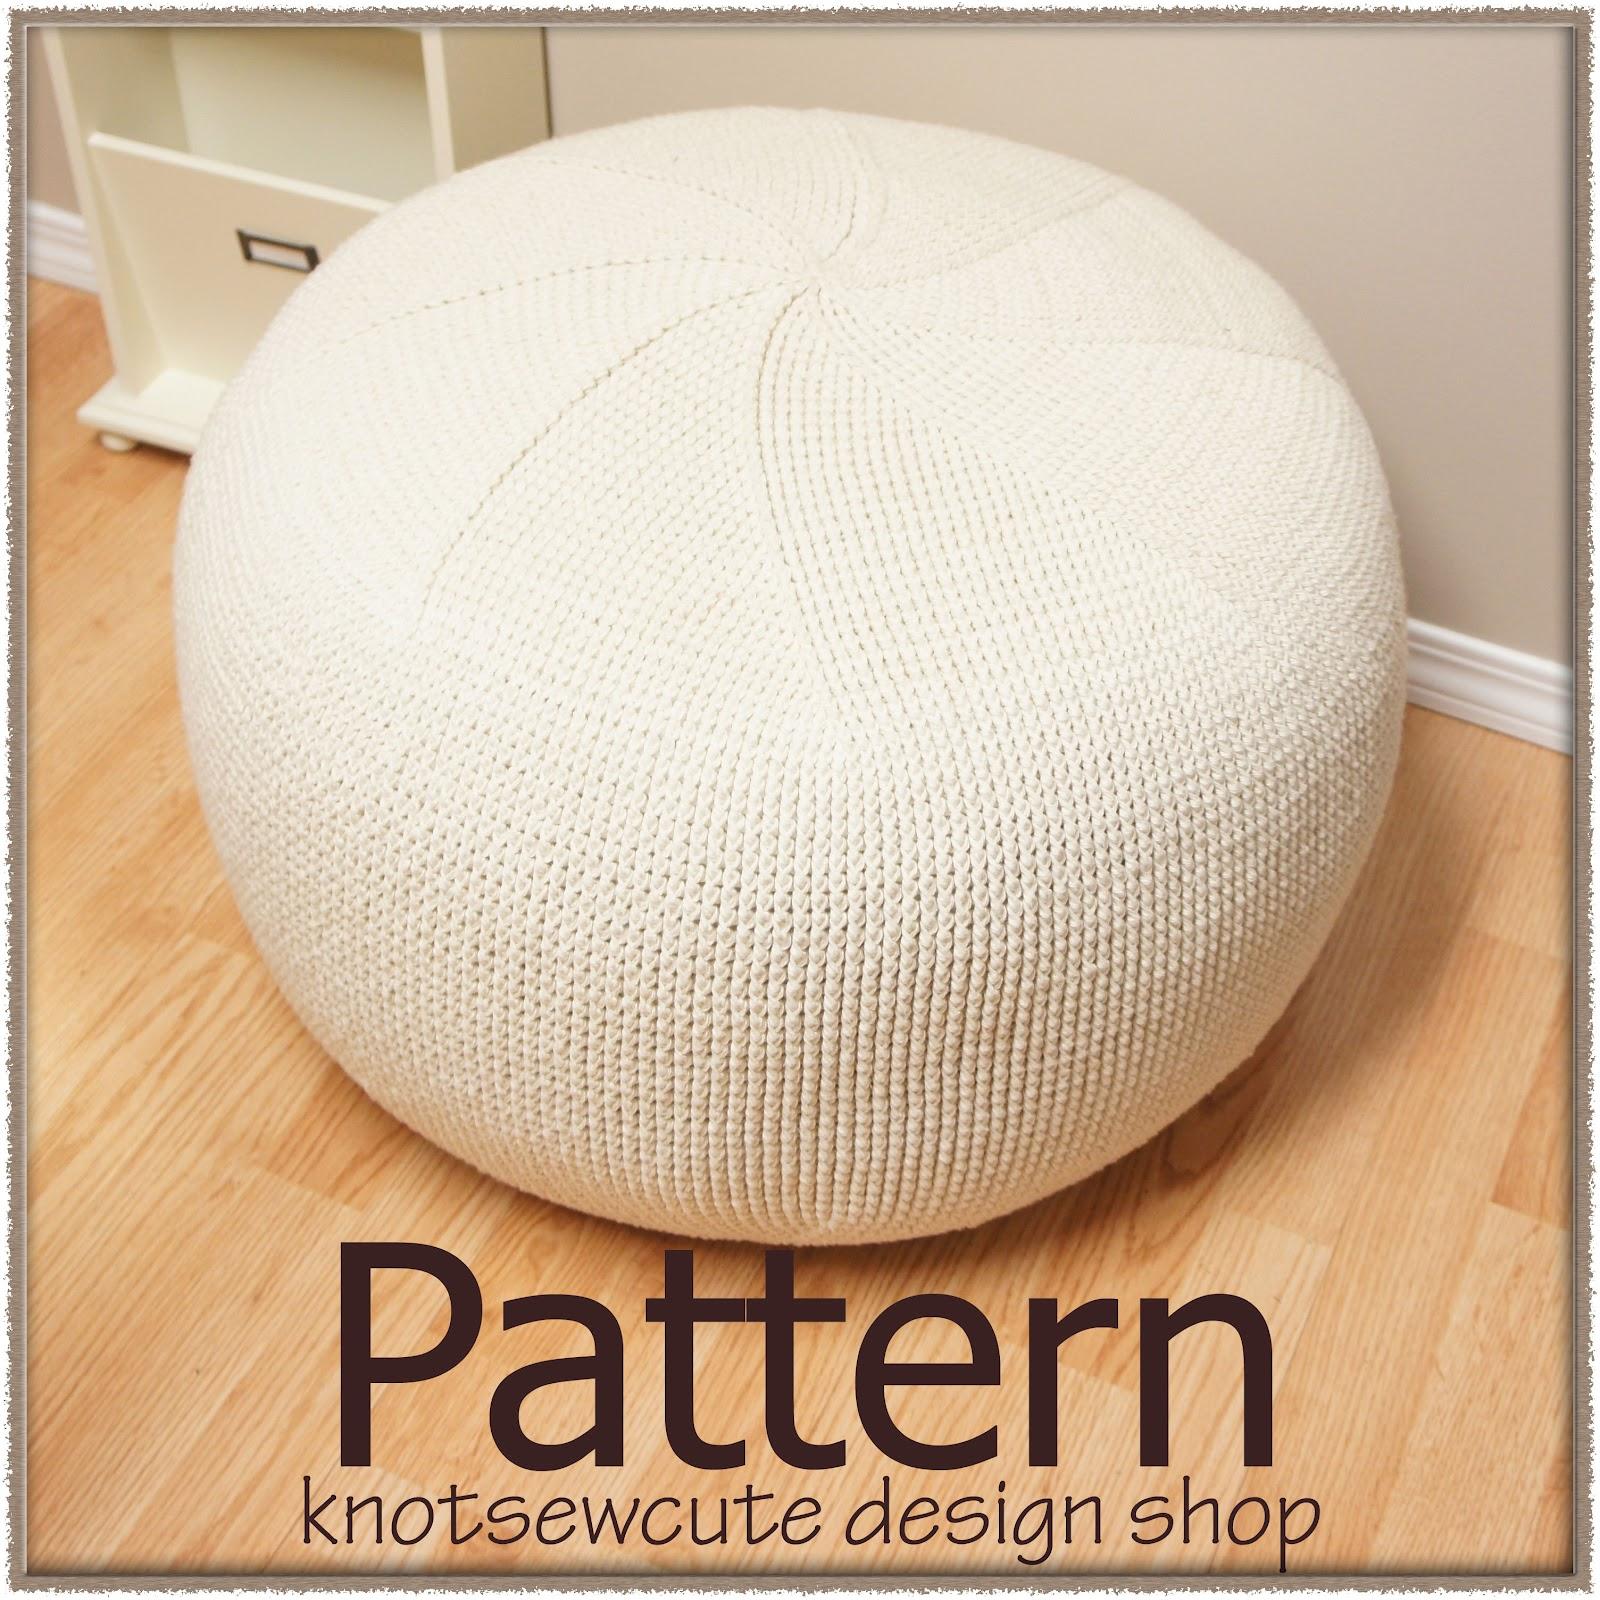 Knot sew cute design shop new crochet pattern pinwheel pouf by tara schreyer - Crochet pouf ottoman pattern free ...